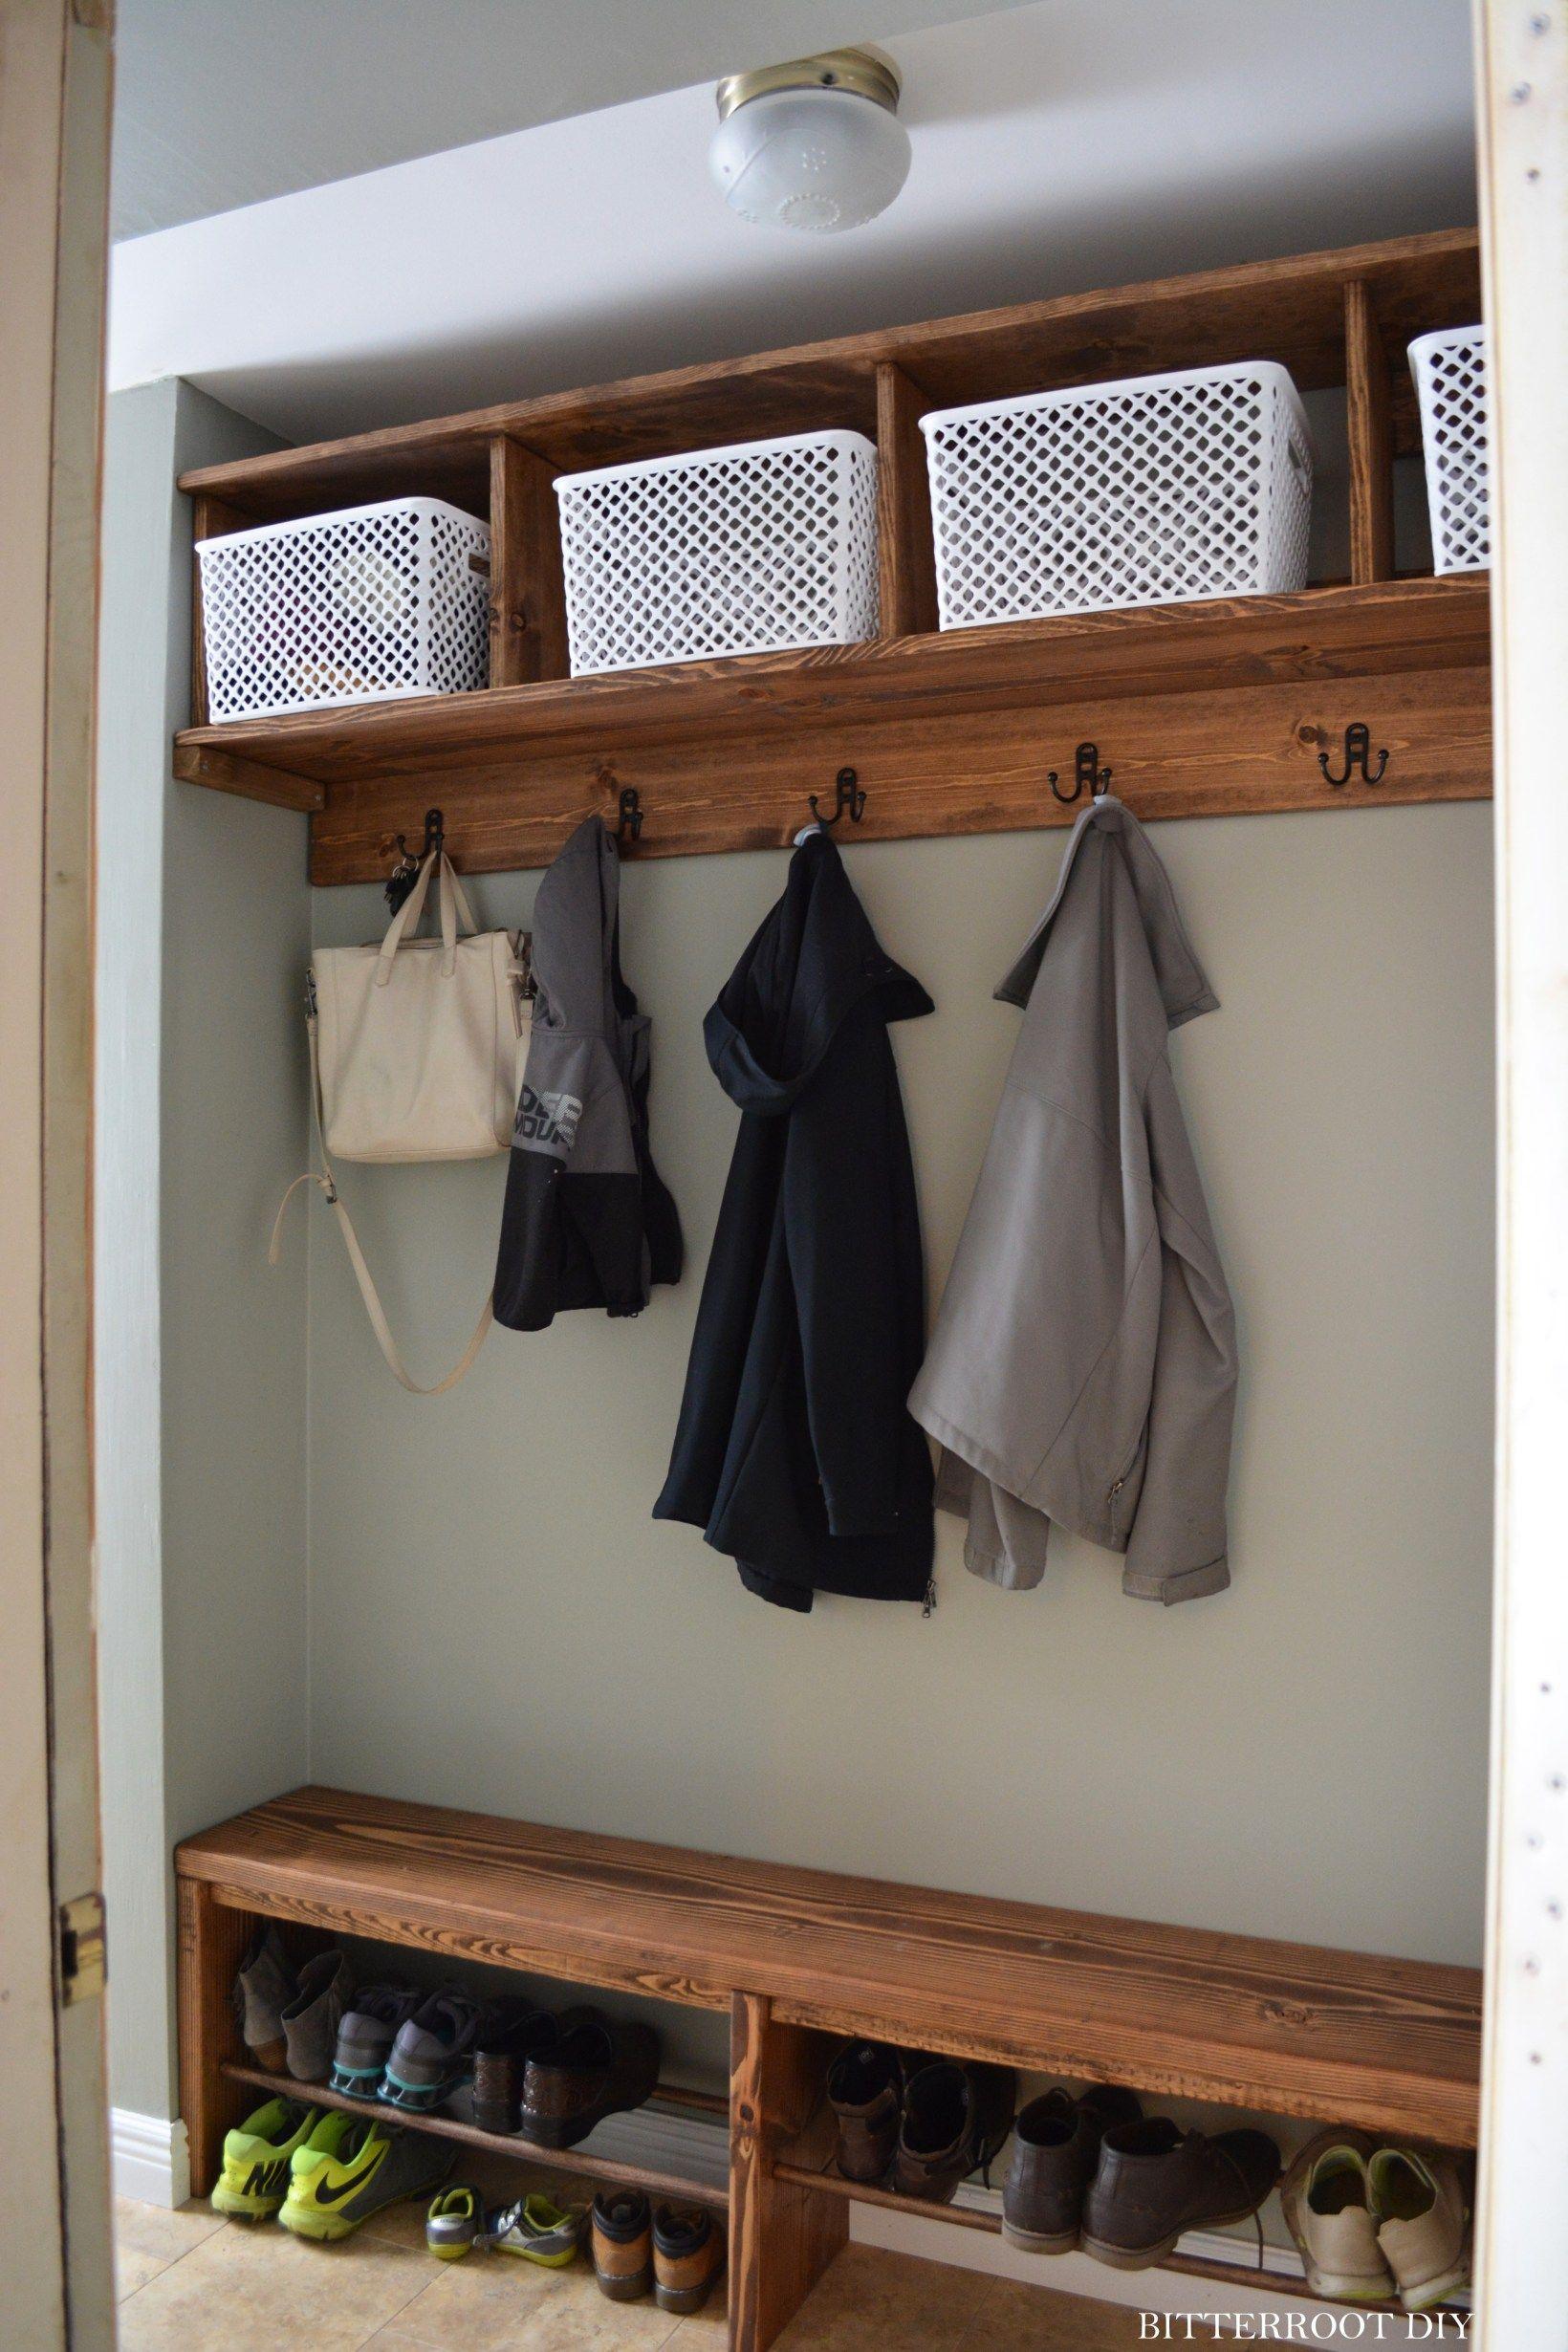 Easy Mudroom Bench With Shoe Storage Bench With Shoe Storage Diy Storage Bench Shoe Storage Bench Diy